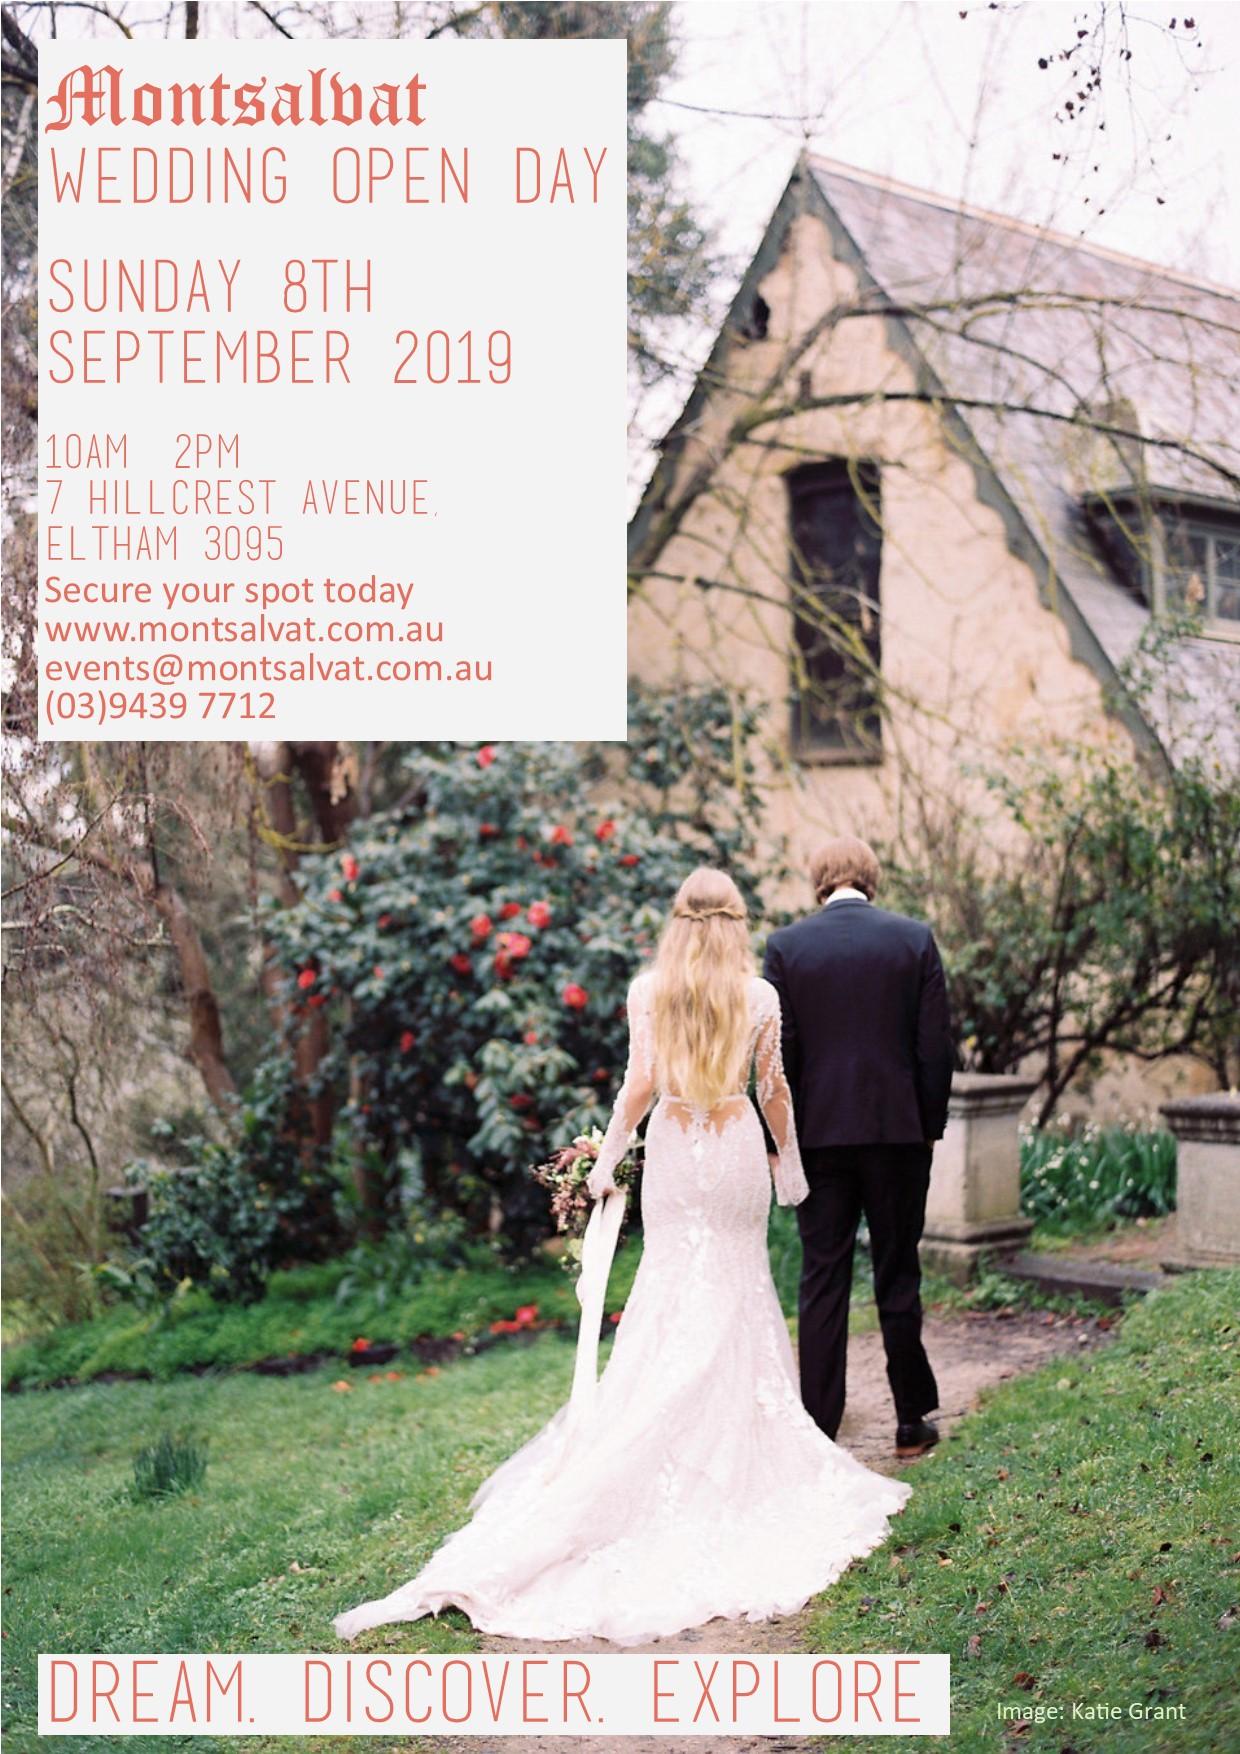 Montsalvat wedding open day 2019